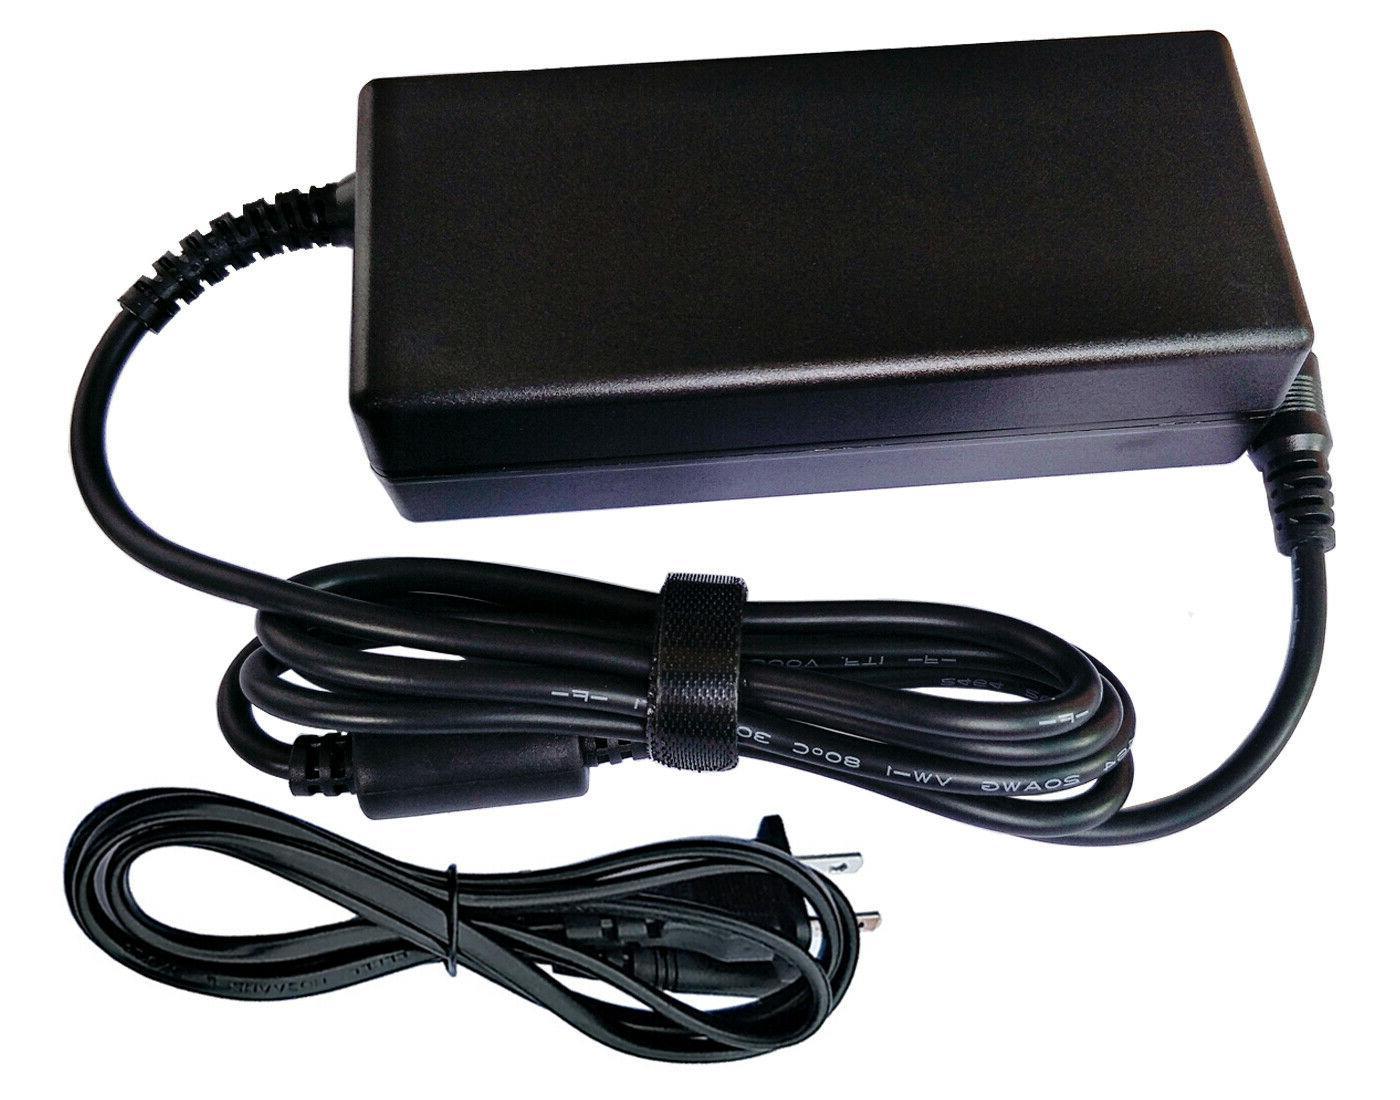 AC Adapter CGN-DP Comcast Docsis Probe